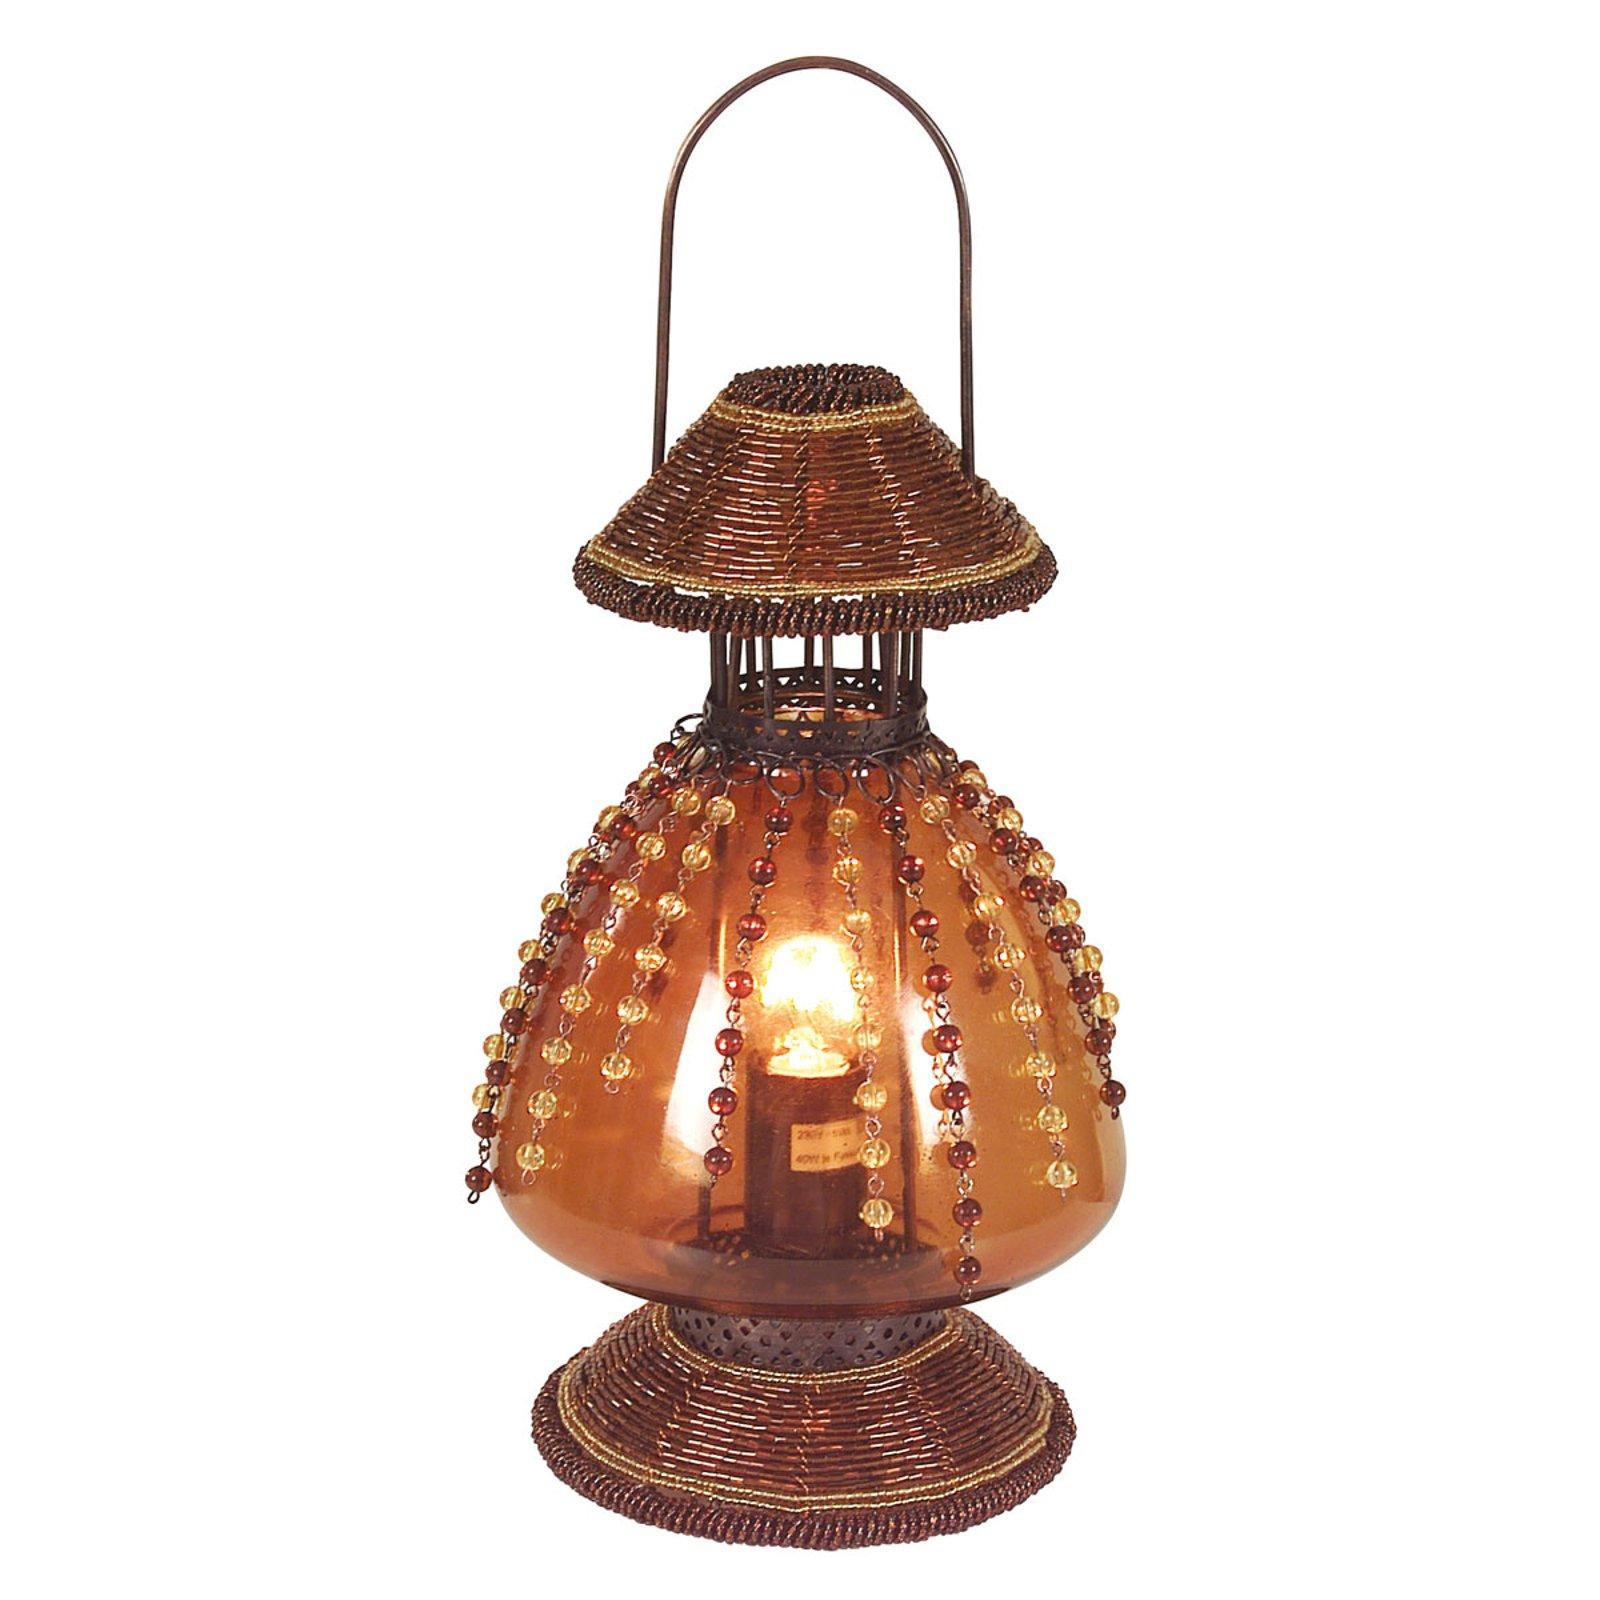 Bordlampe Perla som parafinlampe, rustbrun